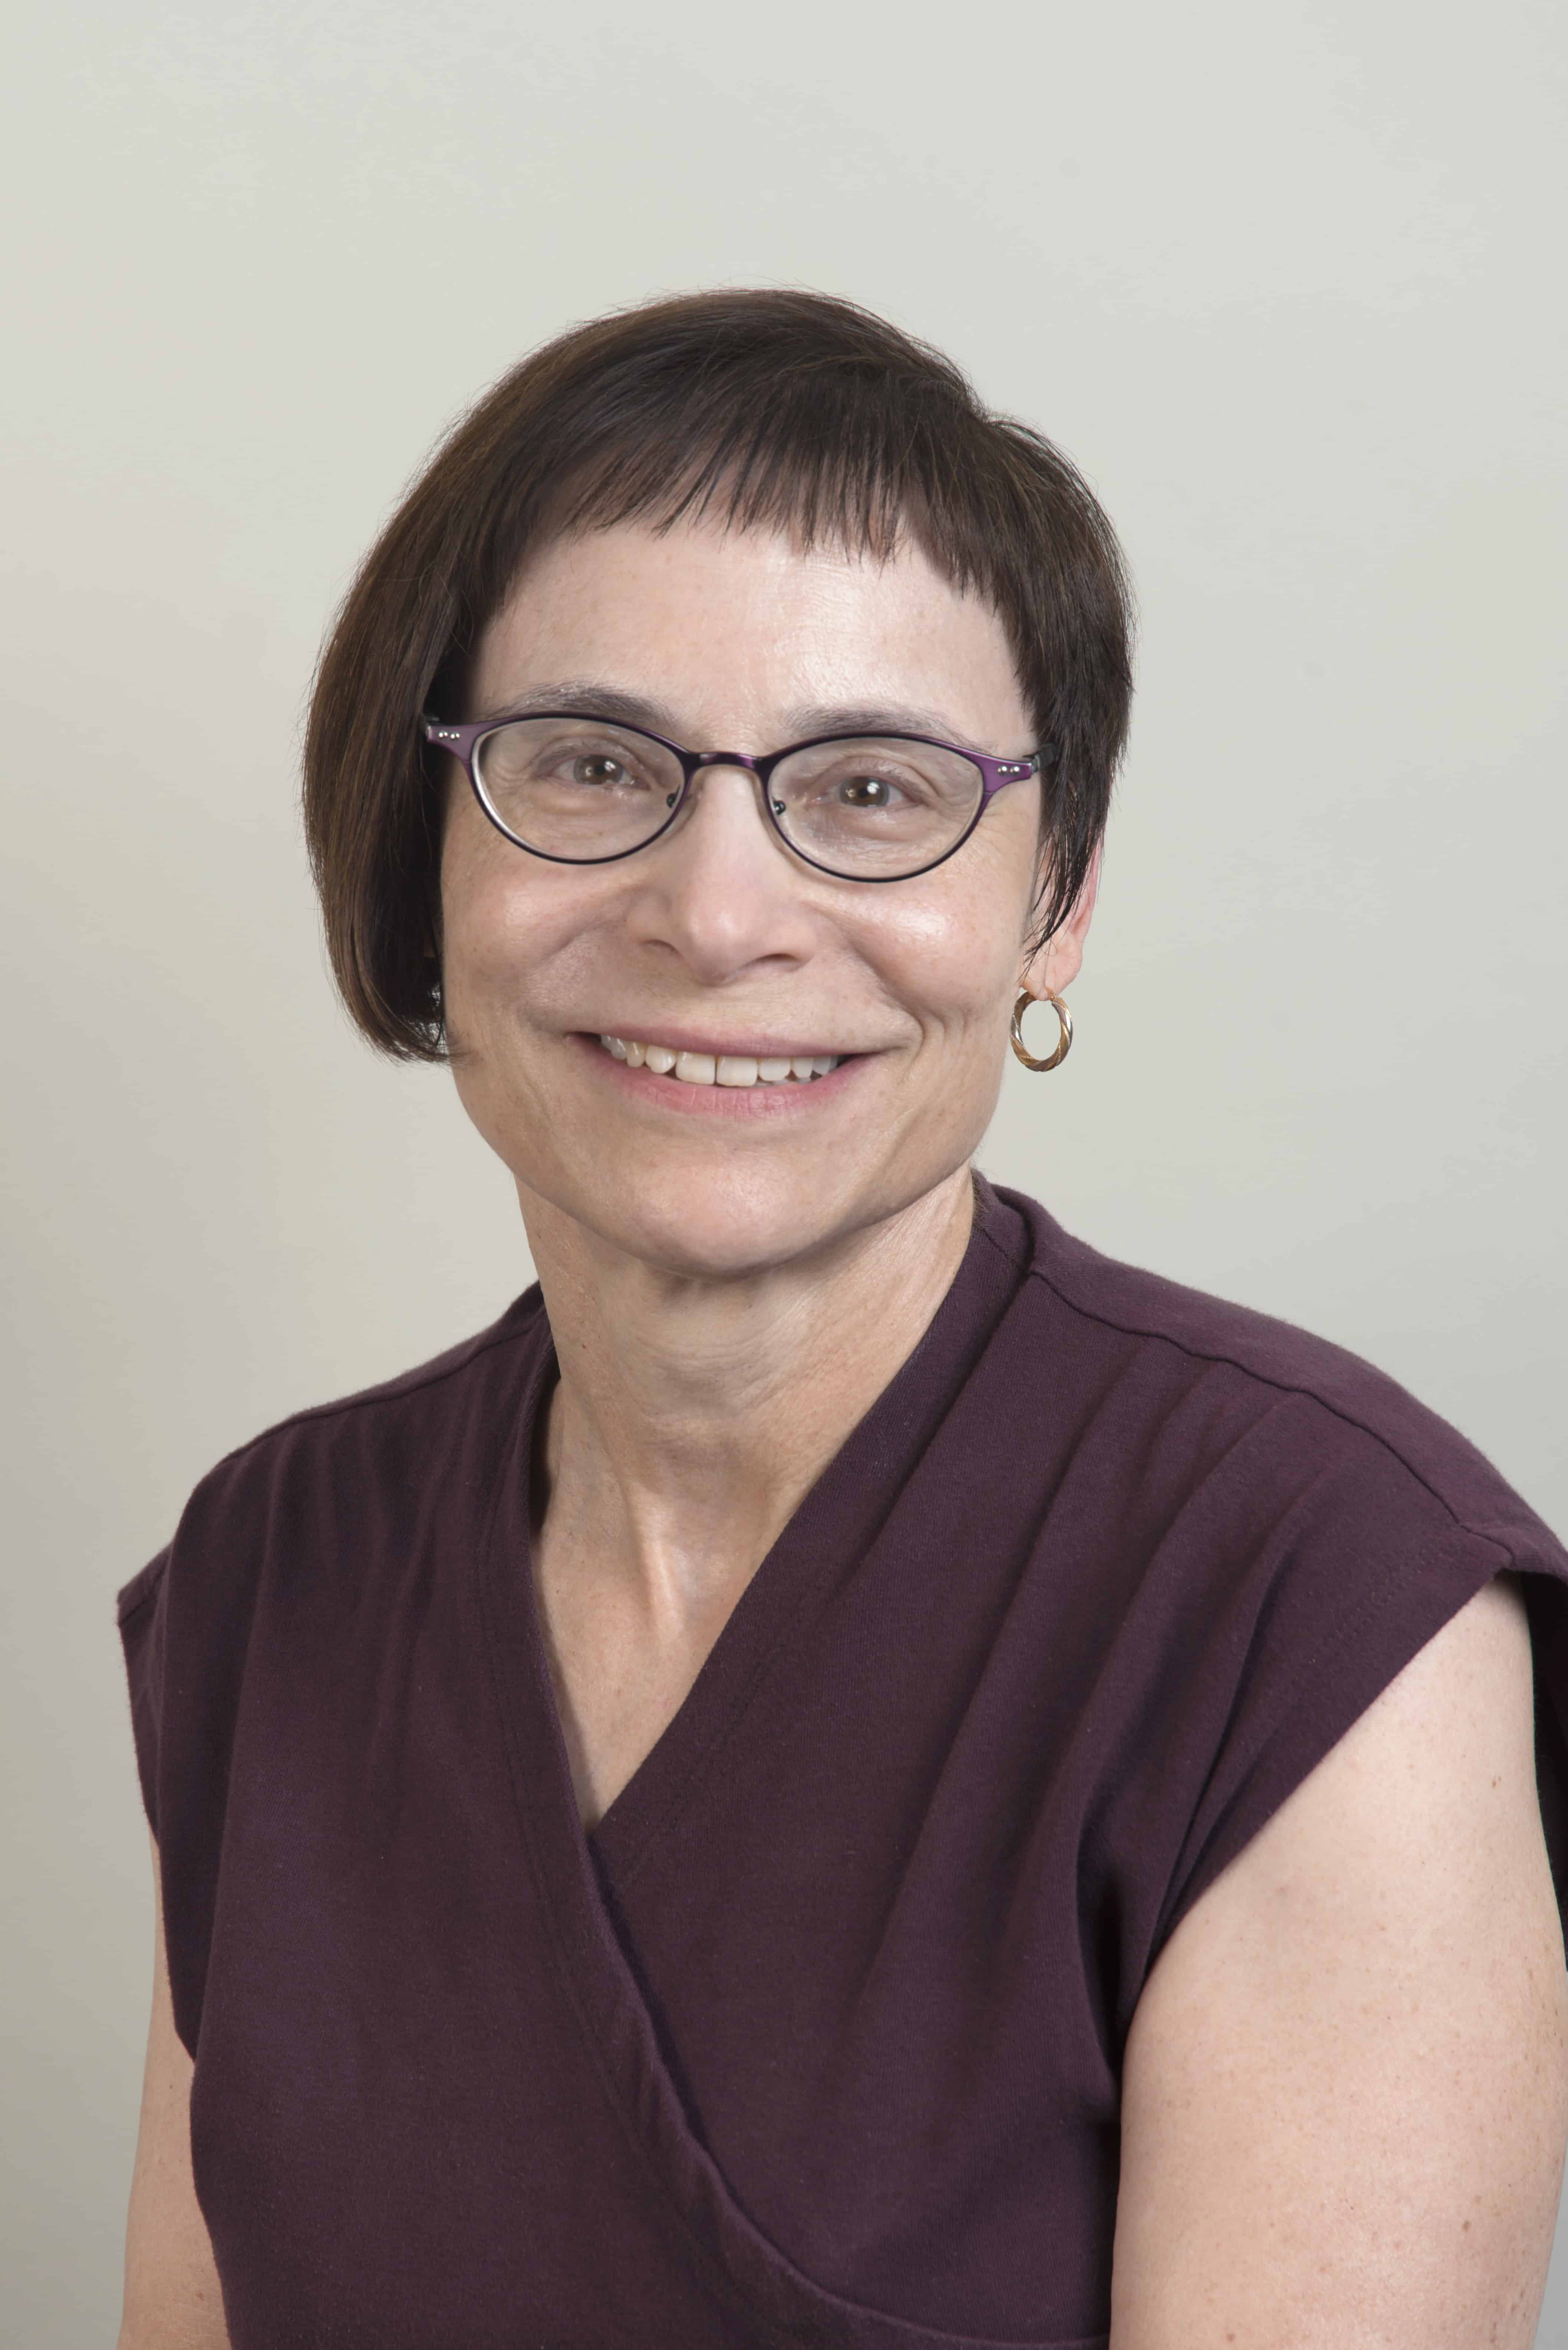 Teresa-Seeman